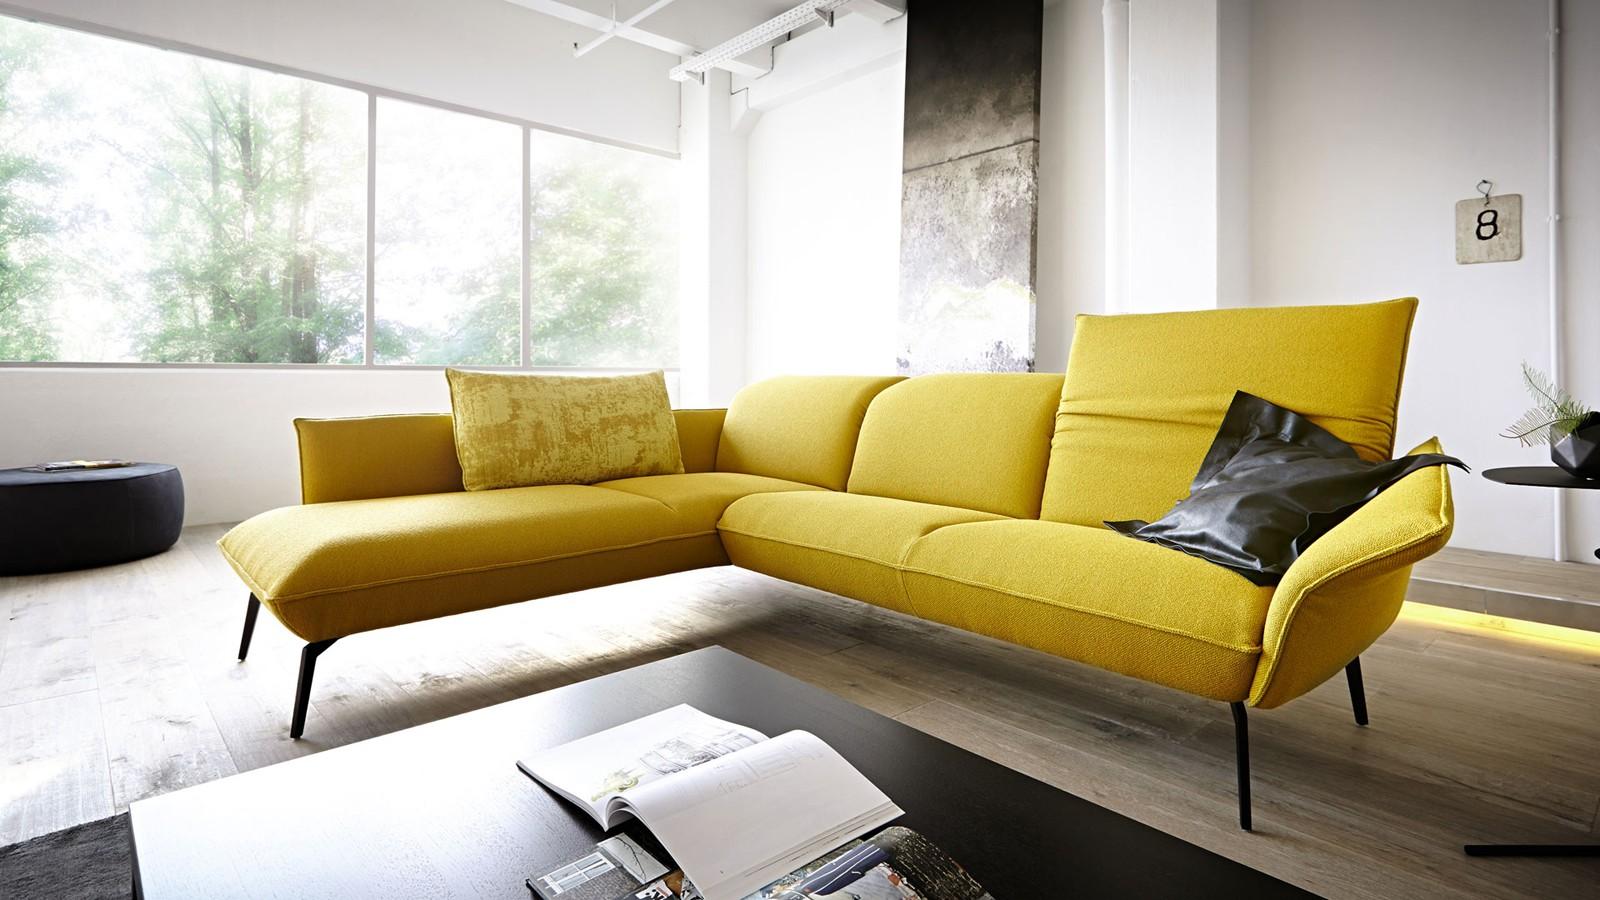 Canapea modernă Koinor Flirt